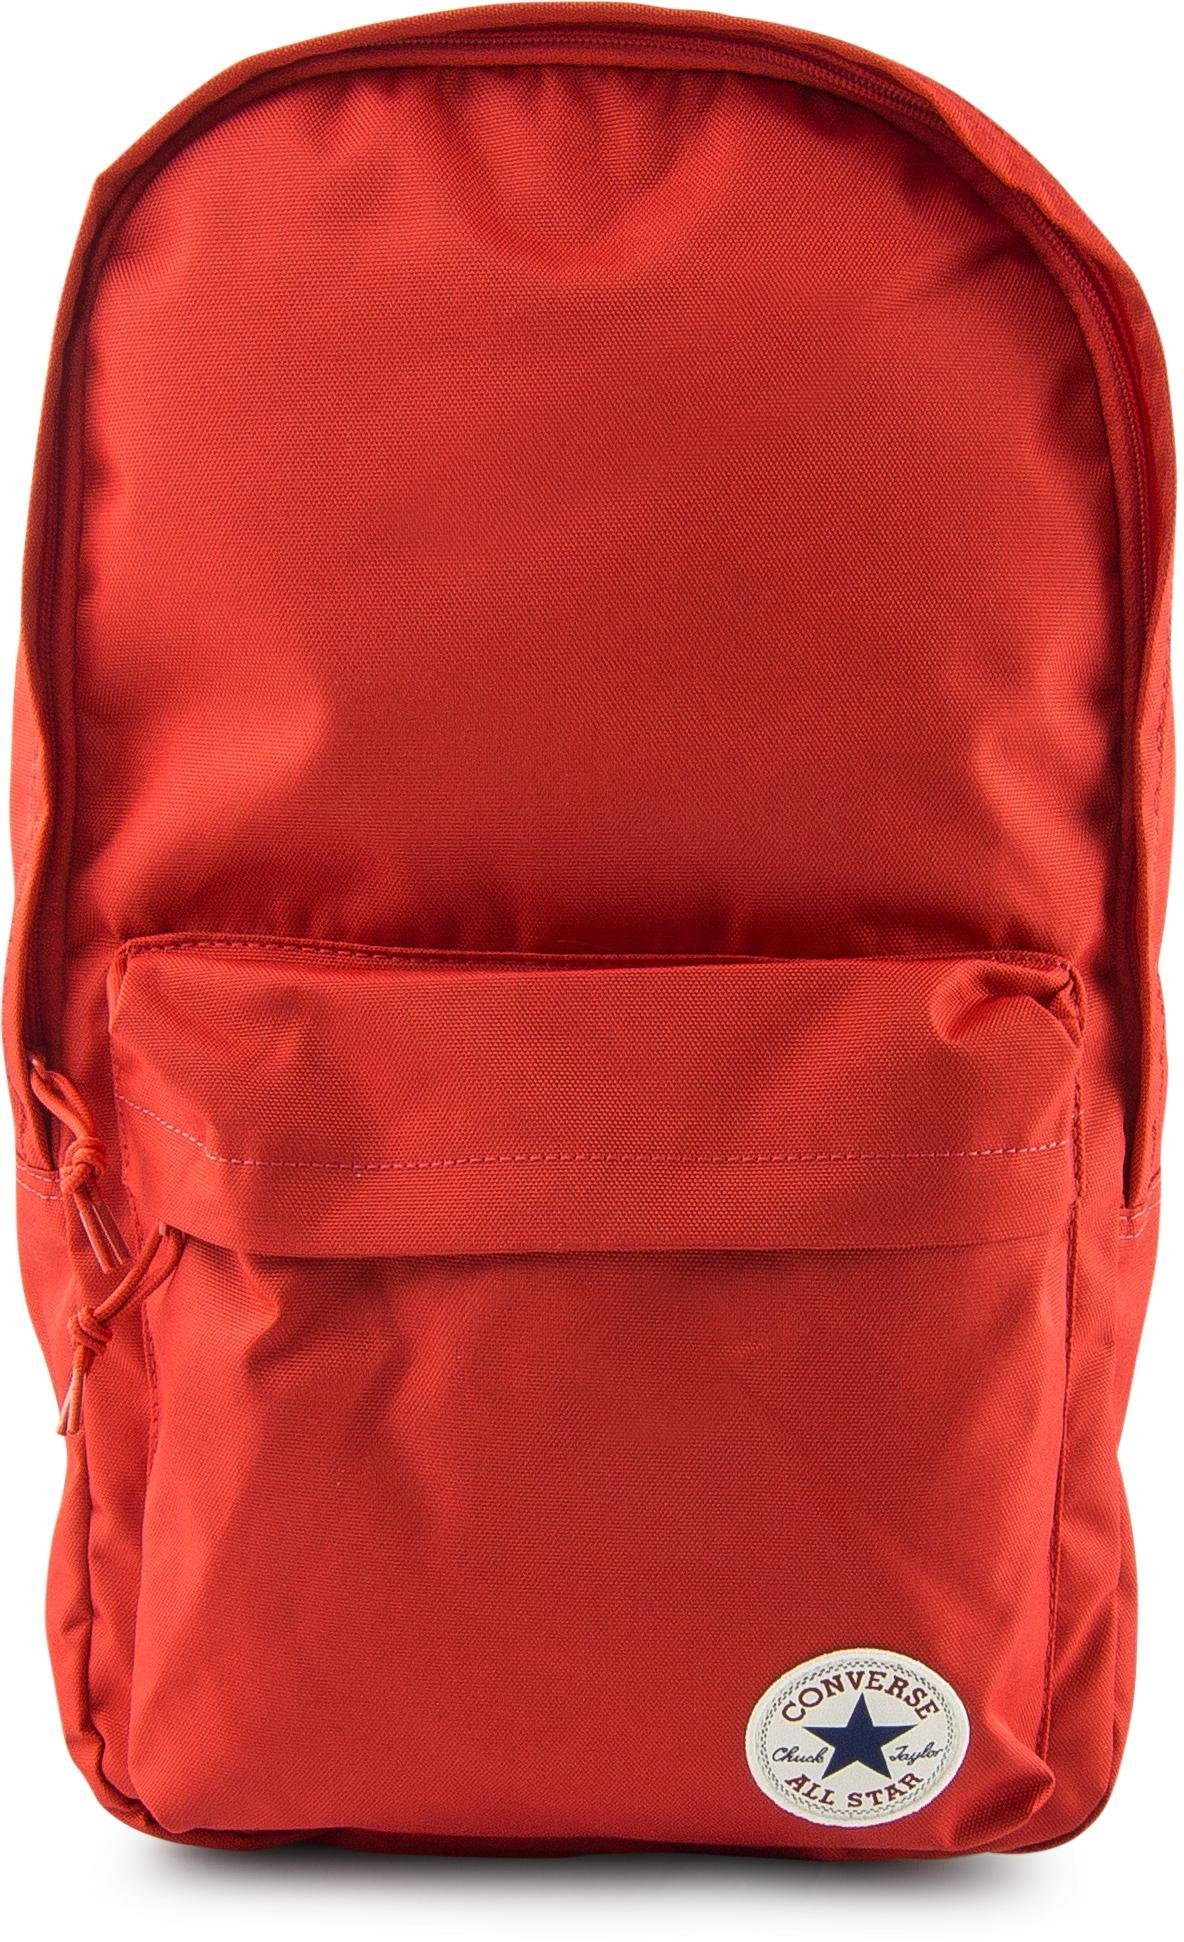 Converse rugzak, »EDC Poly Backpack, Red« voordelig en veilig online kopen